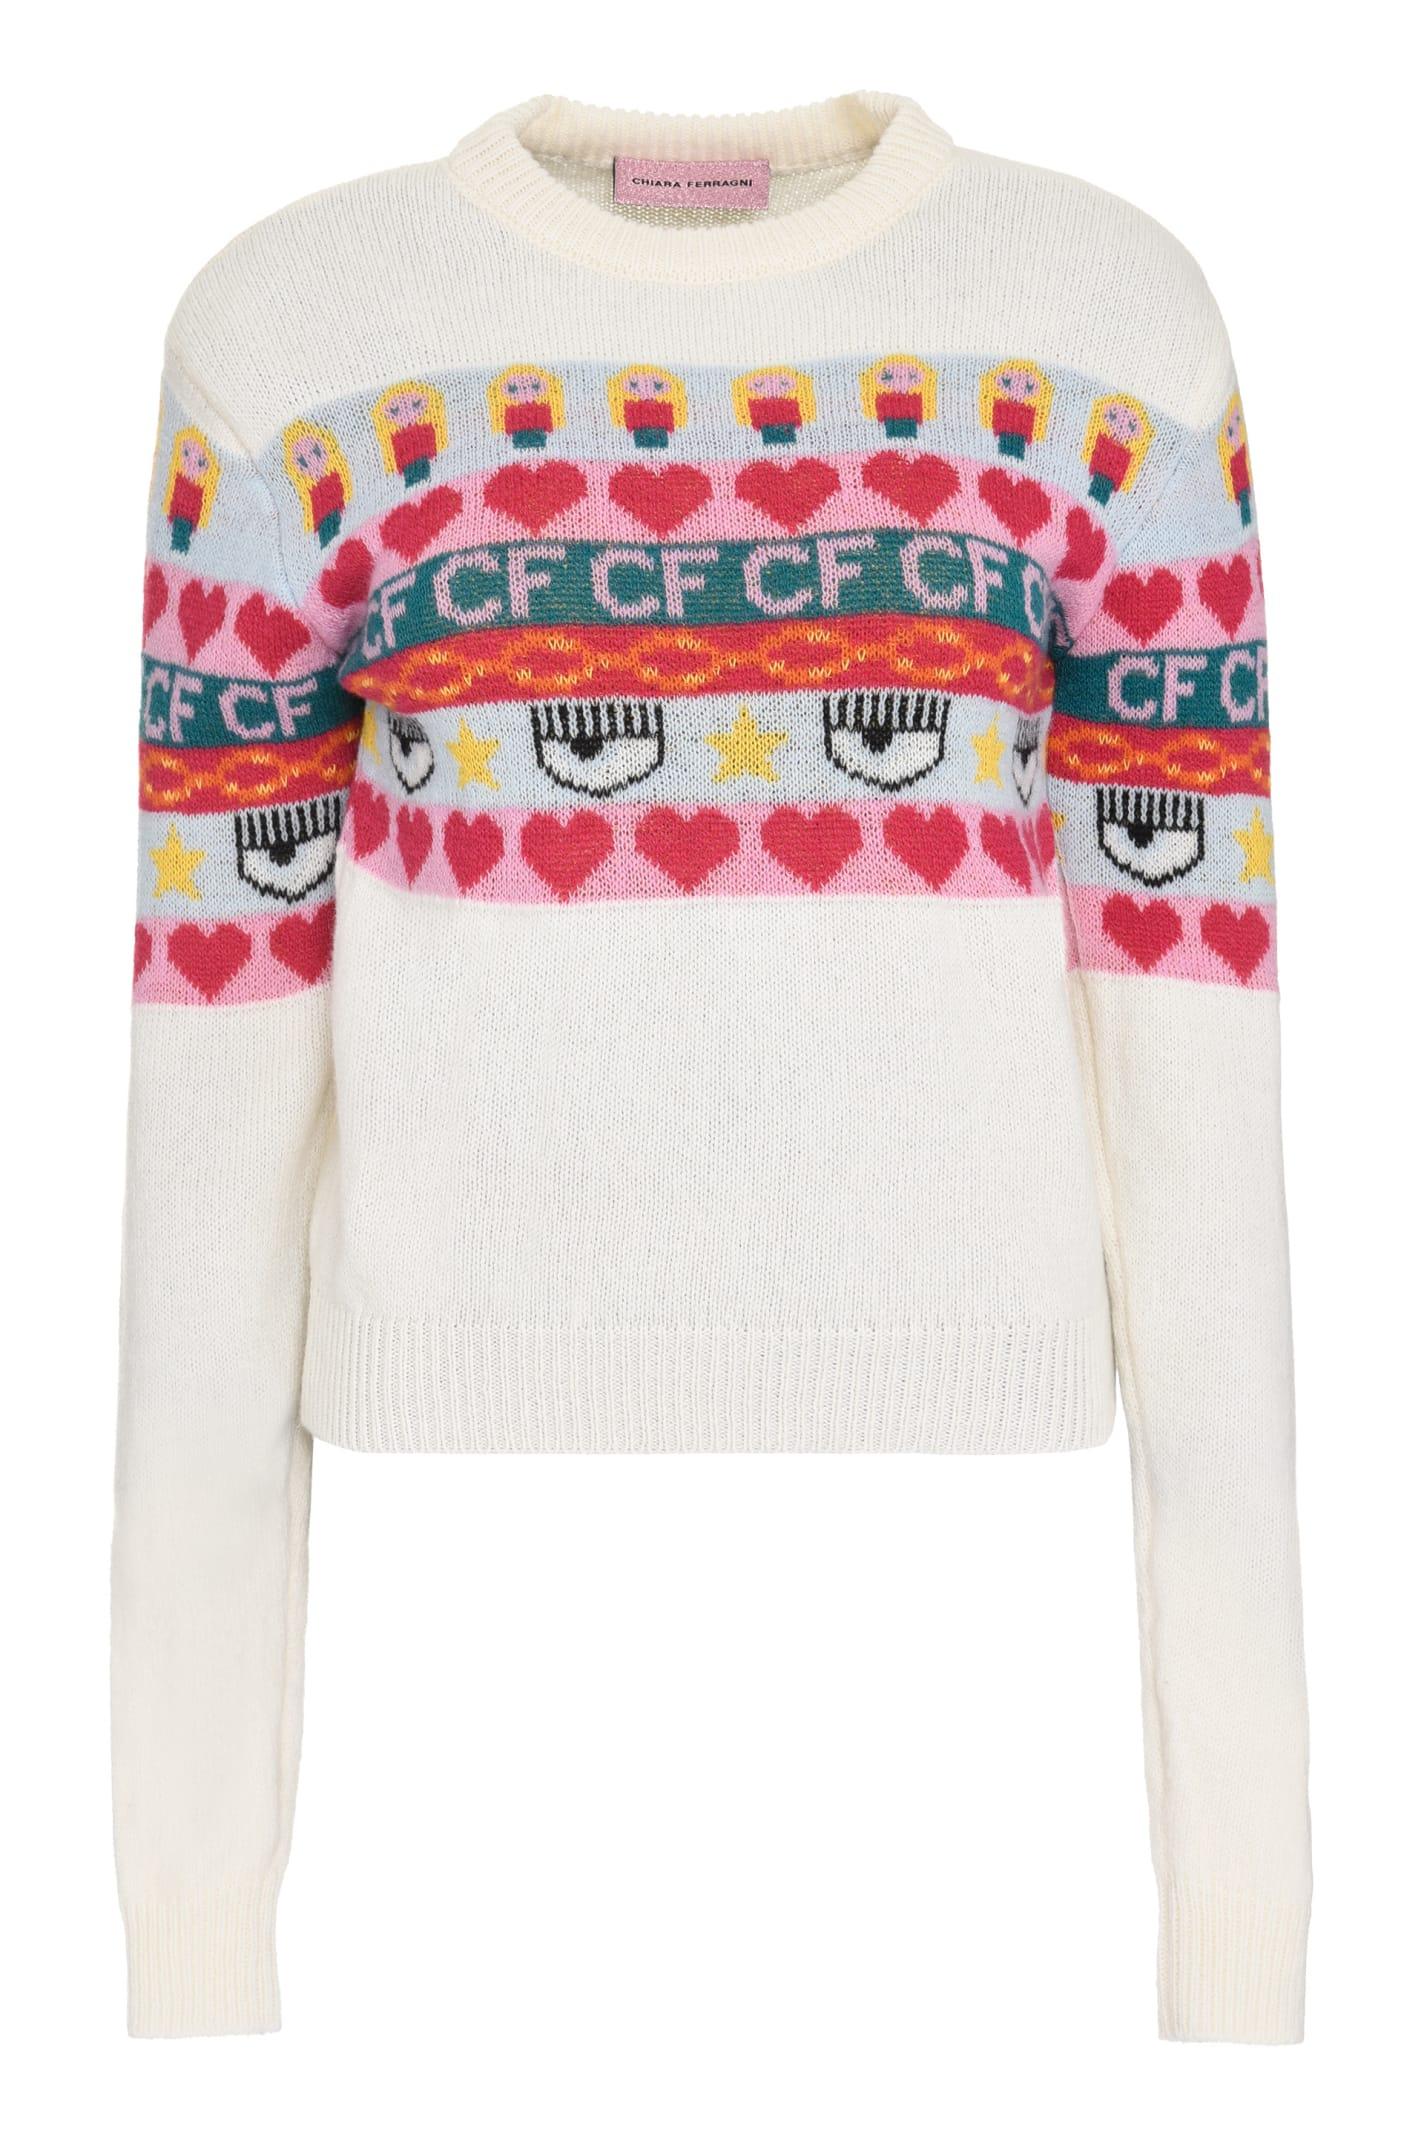 Chiara Ferragni Intarsia Wool And Cashmere Blend Sweater